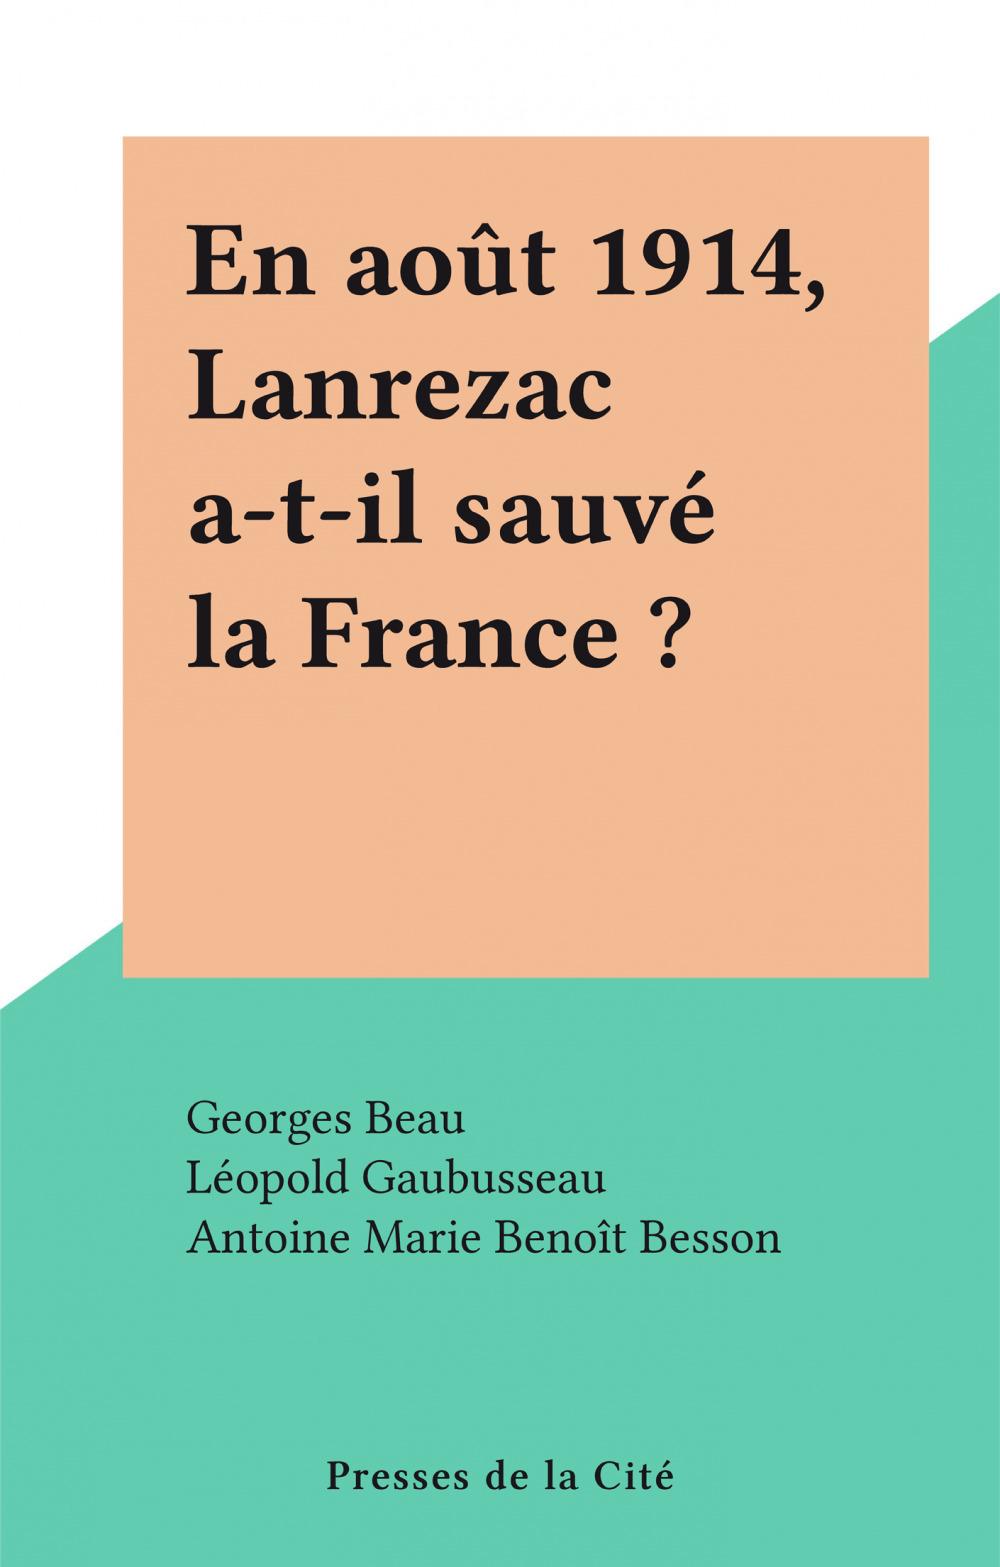 En août 1914, Lanrezac a-t-il sauvé la France ?